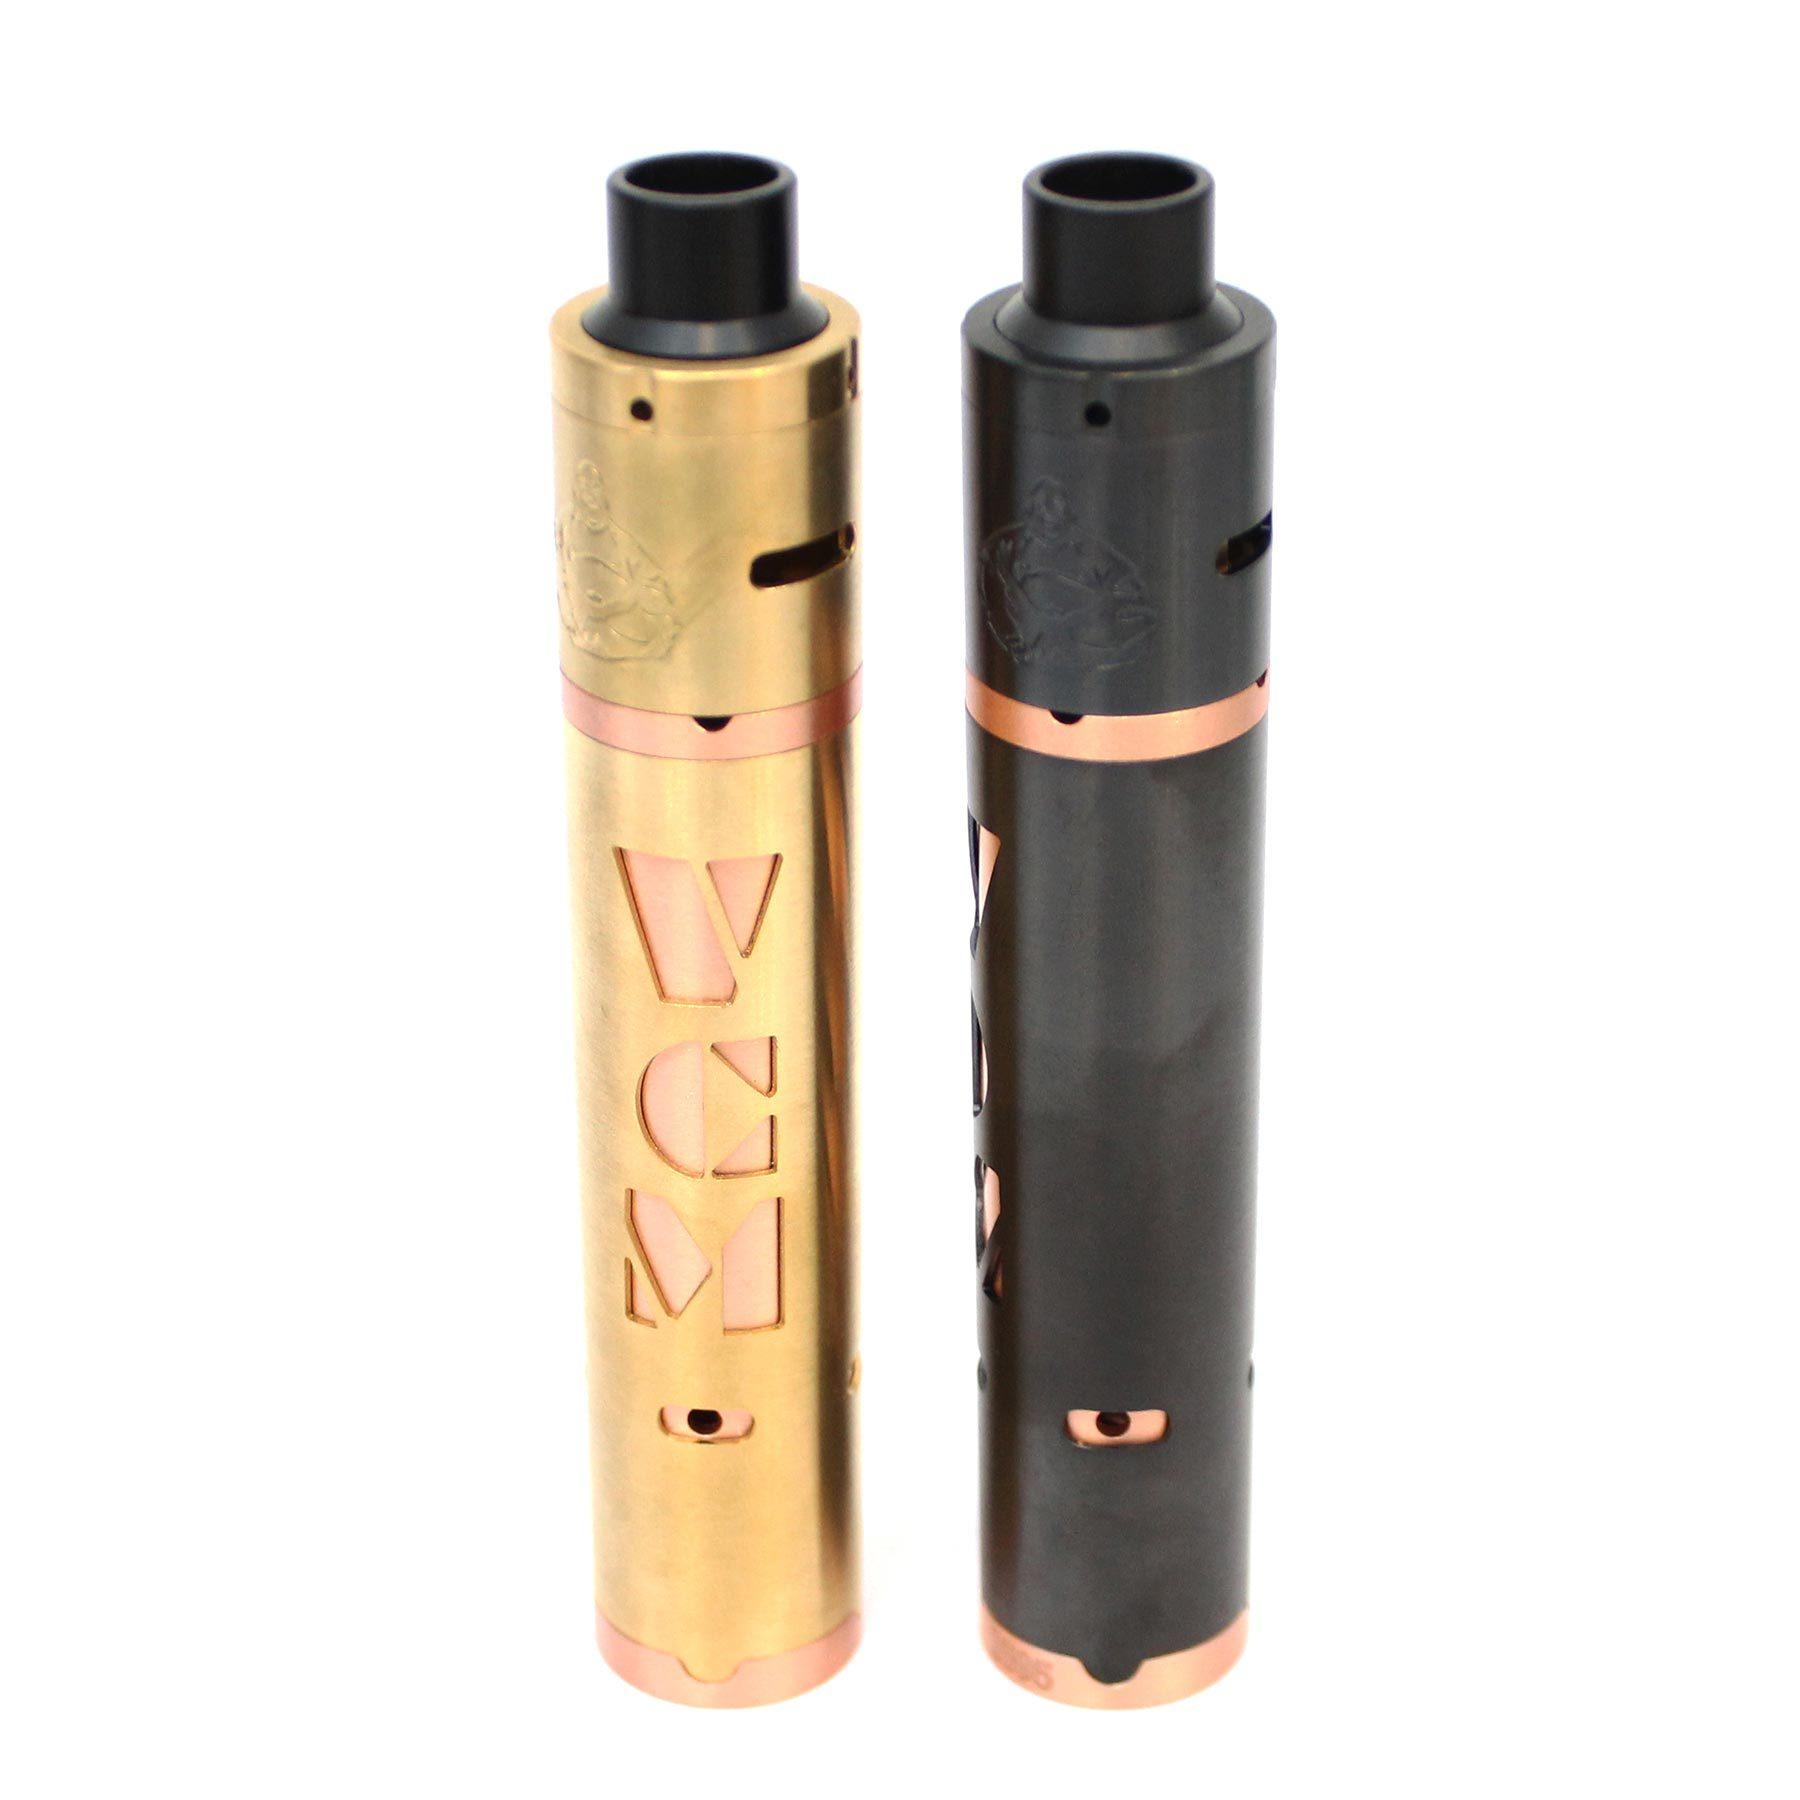 Мехмод VCM v2 set Mod (Clone)